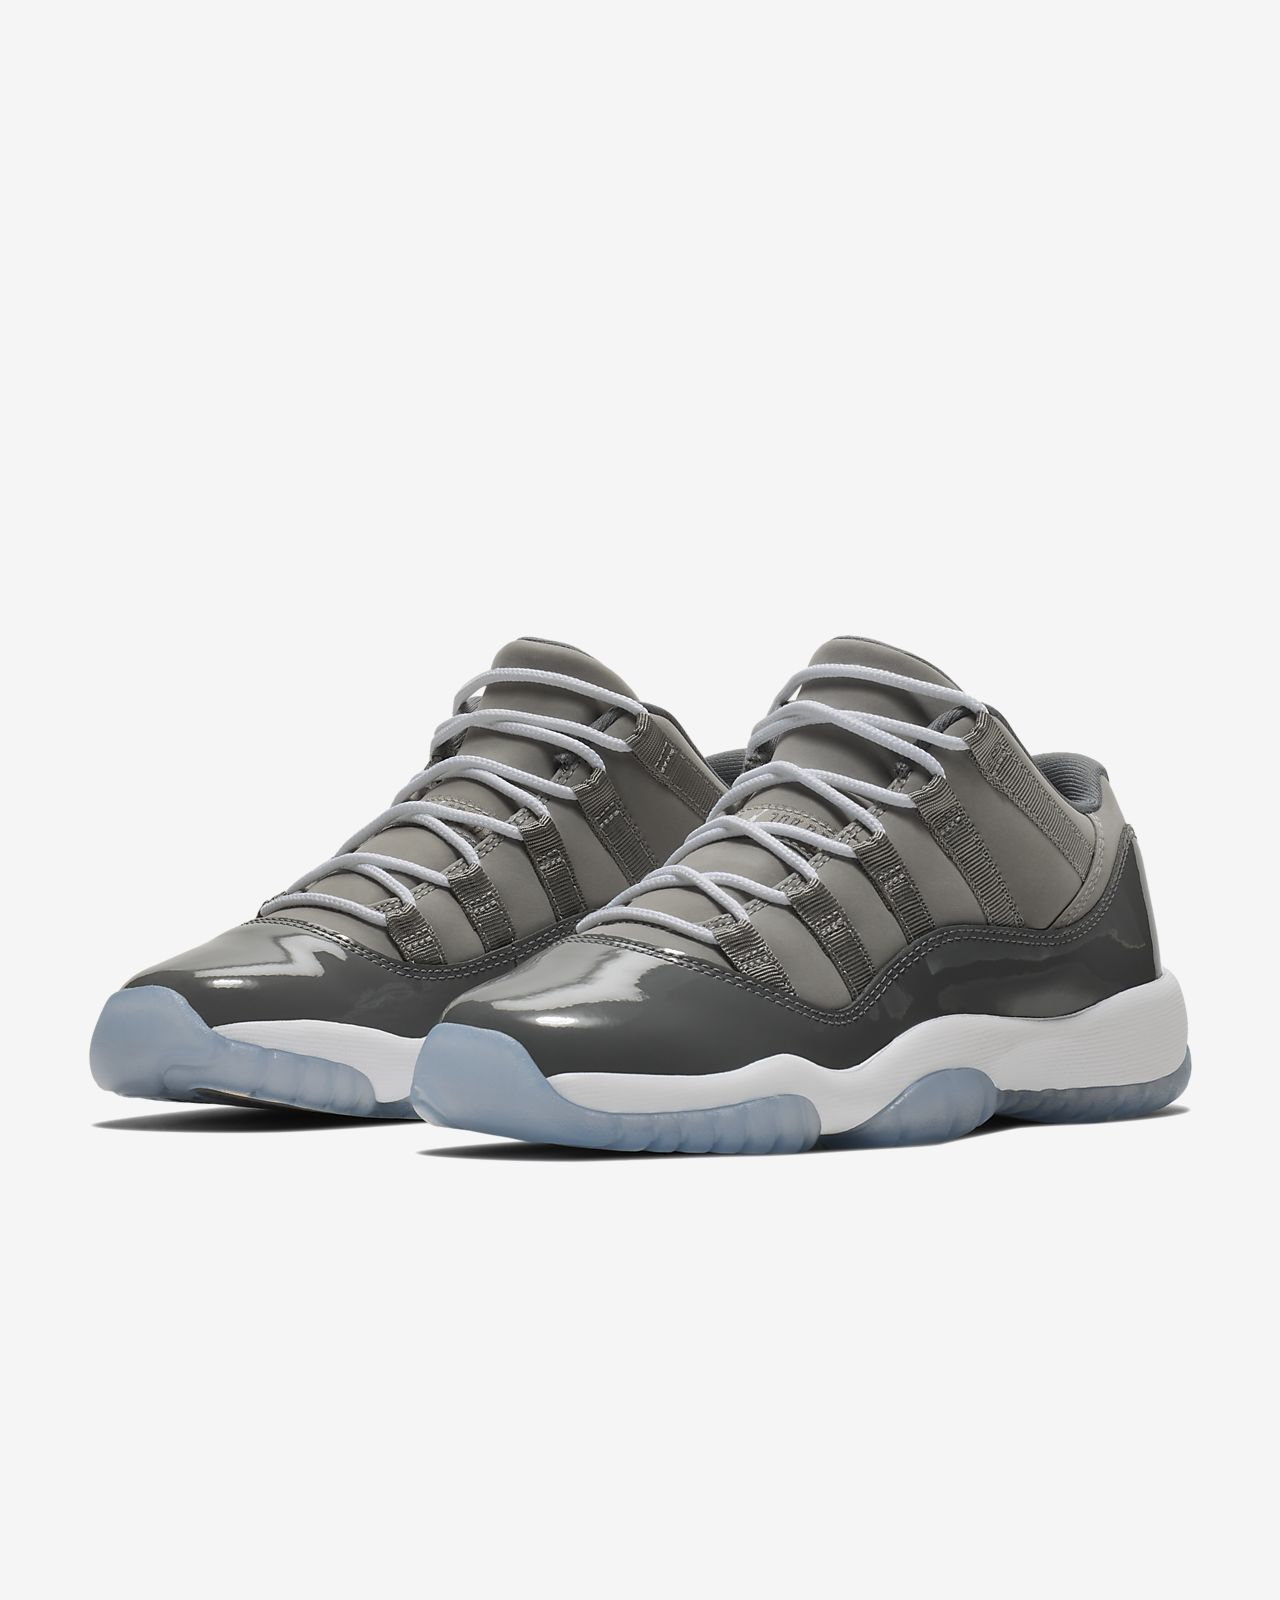 brand new 5dac7 5343b Air Jordan 11 Retro Low Big Kids Shoe . ...